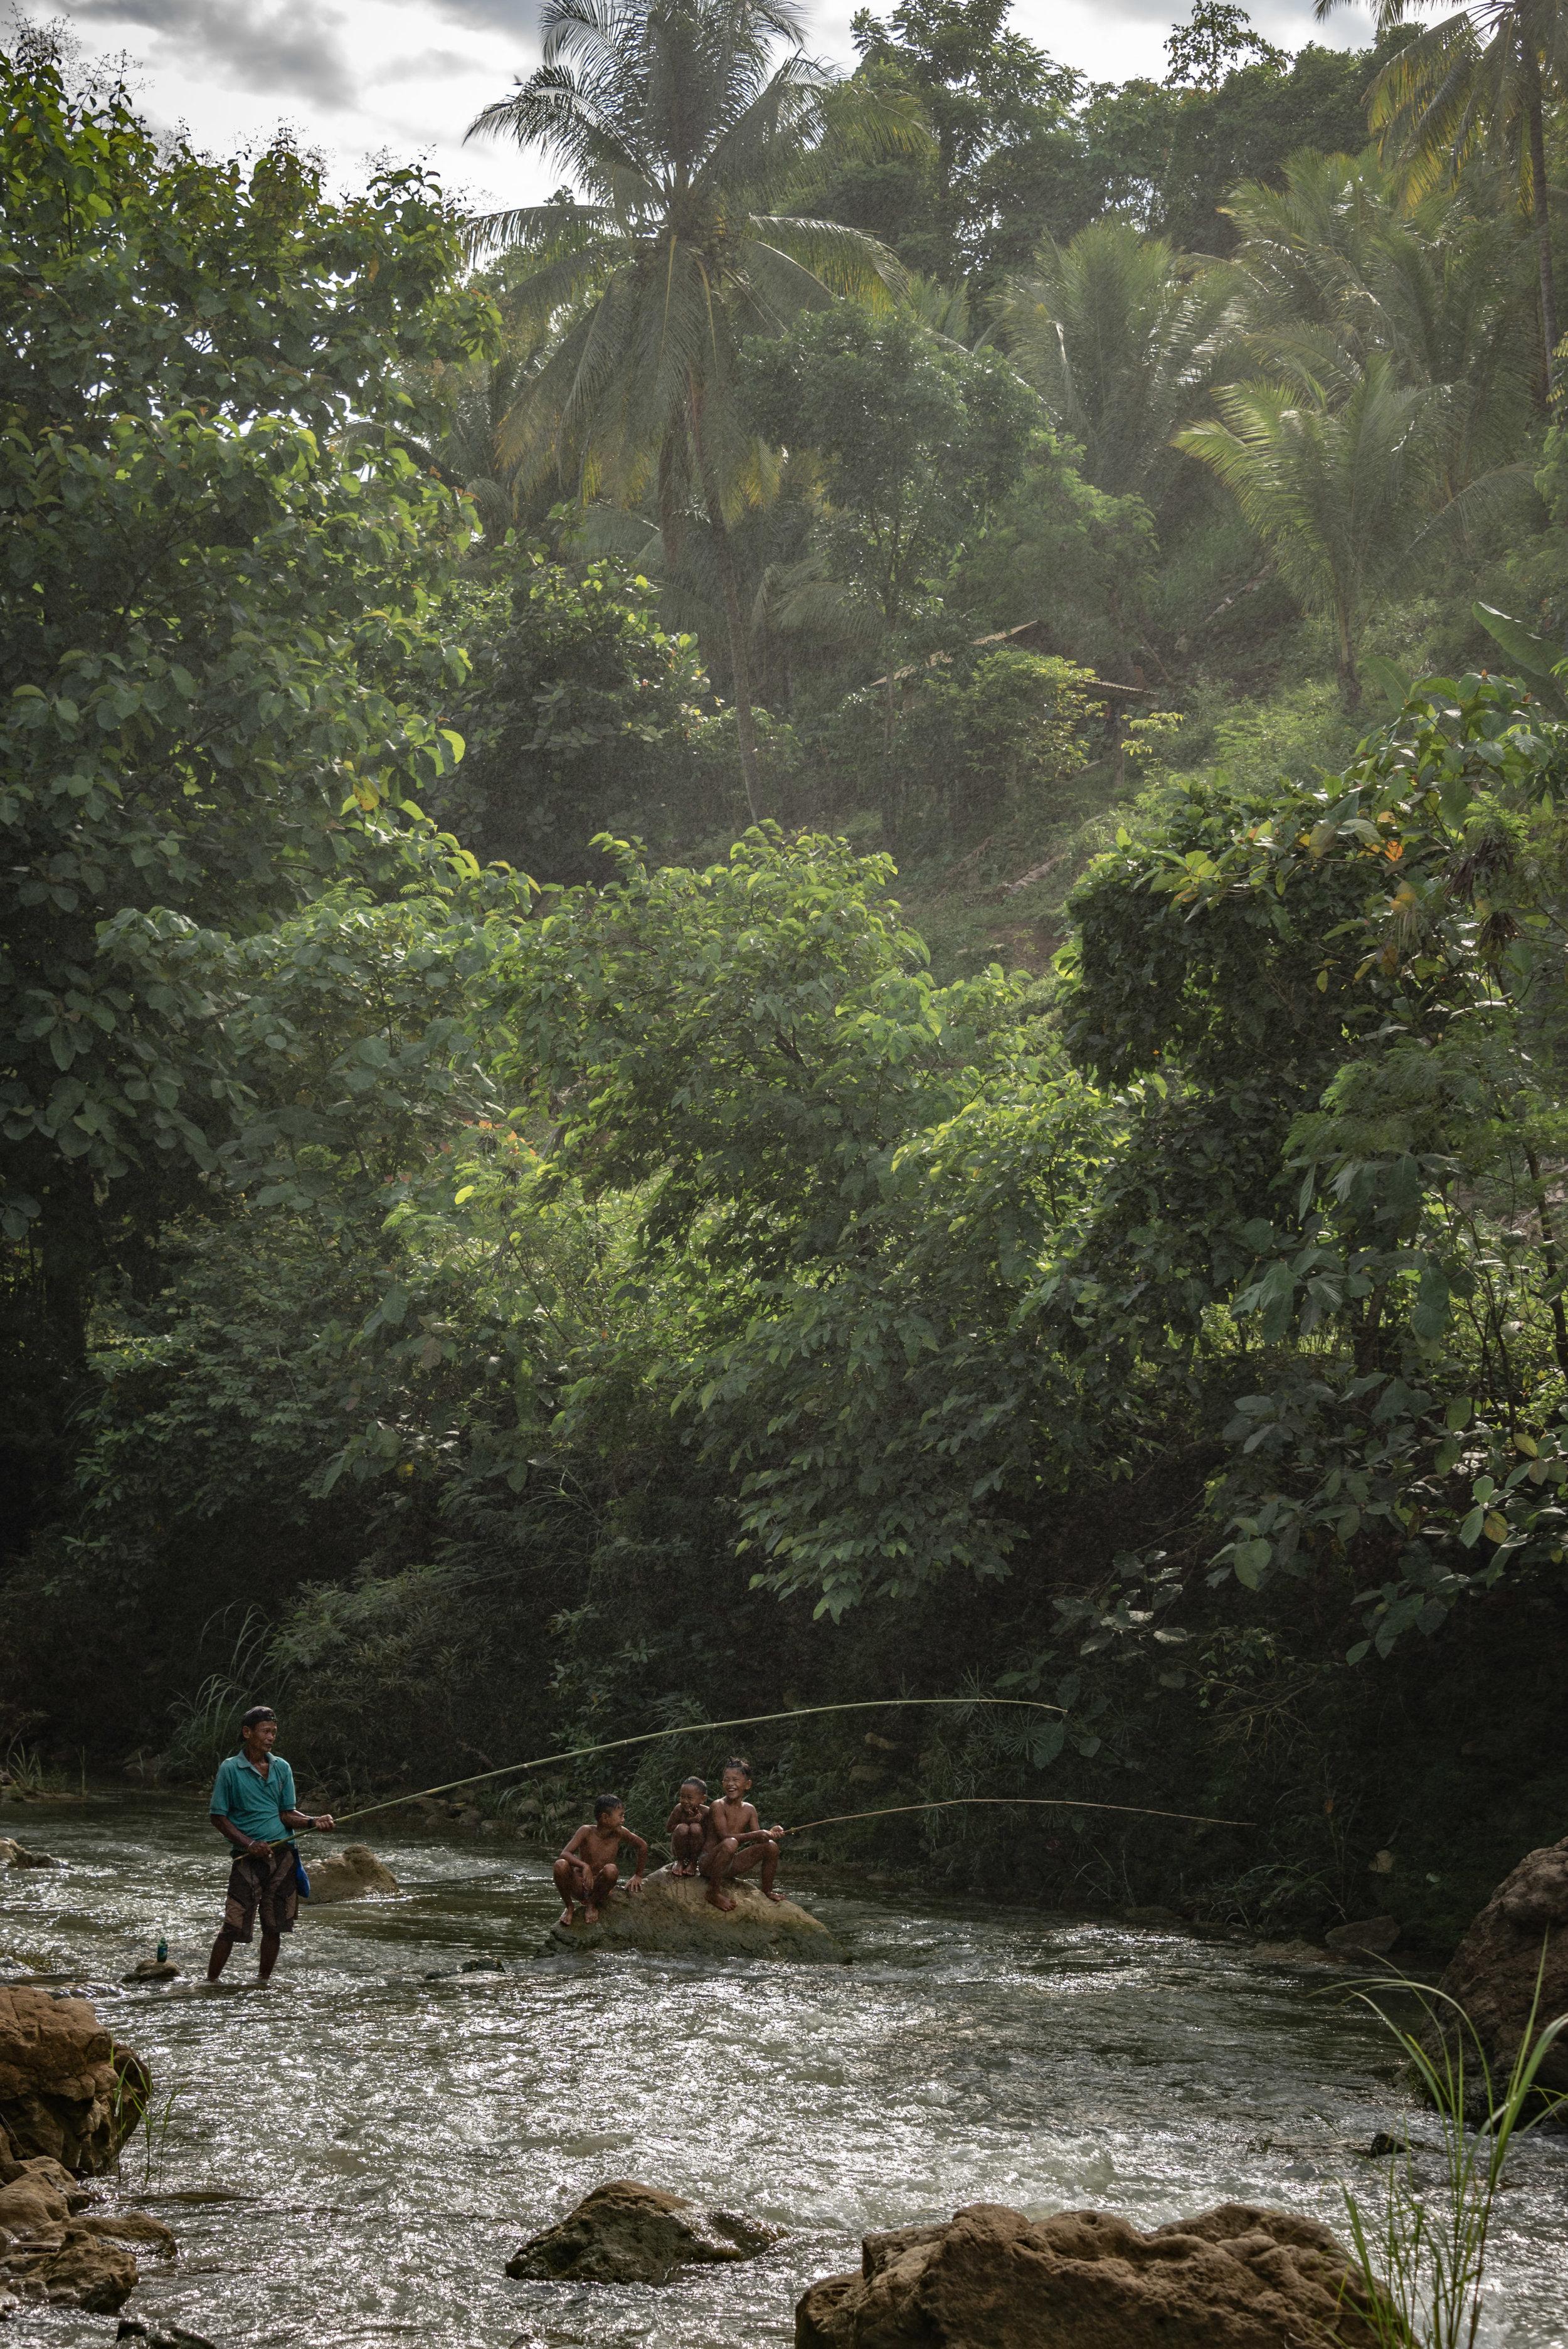 Fisherman and his kids, Niludhan Falls, Negros Island, Philippines